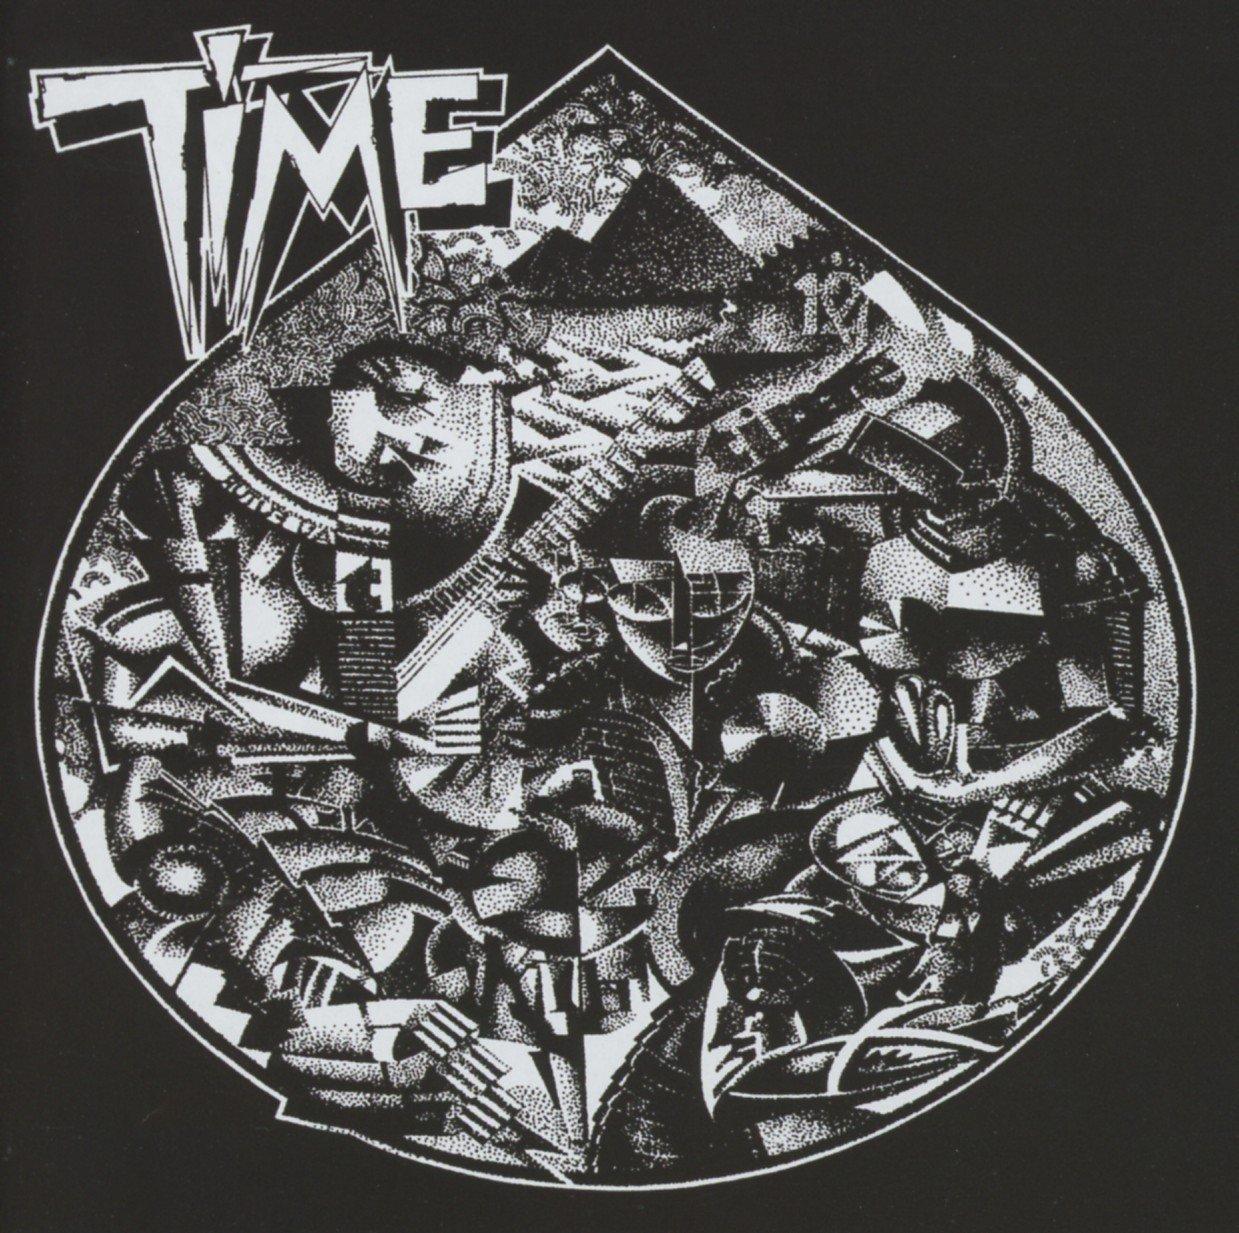 TIME - Time - CD